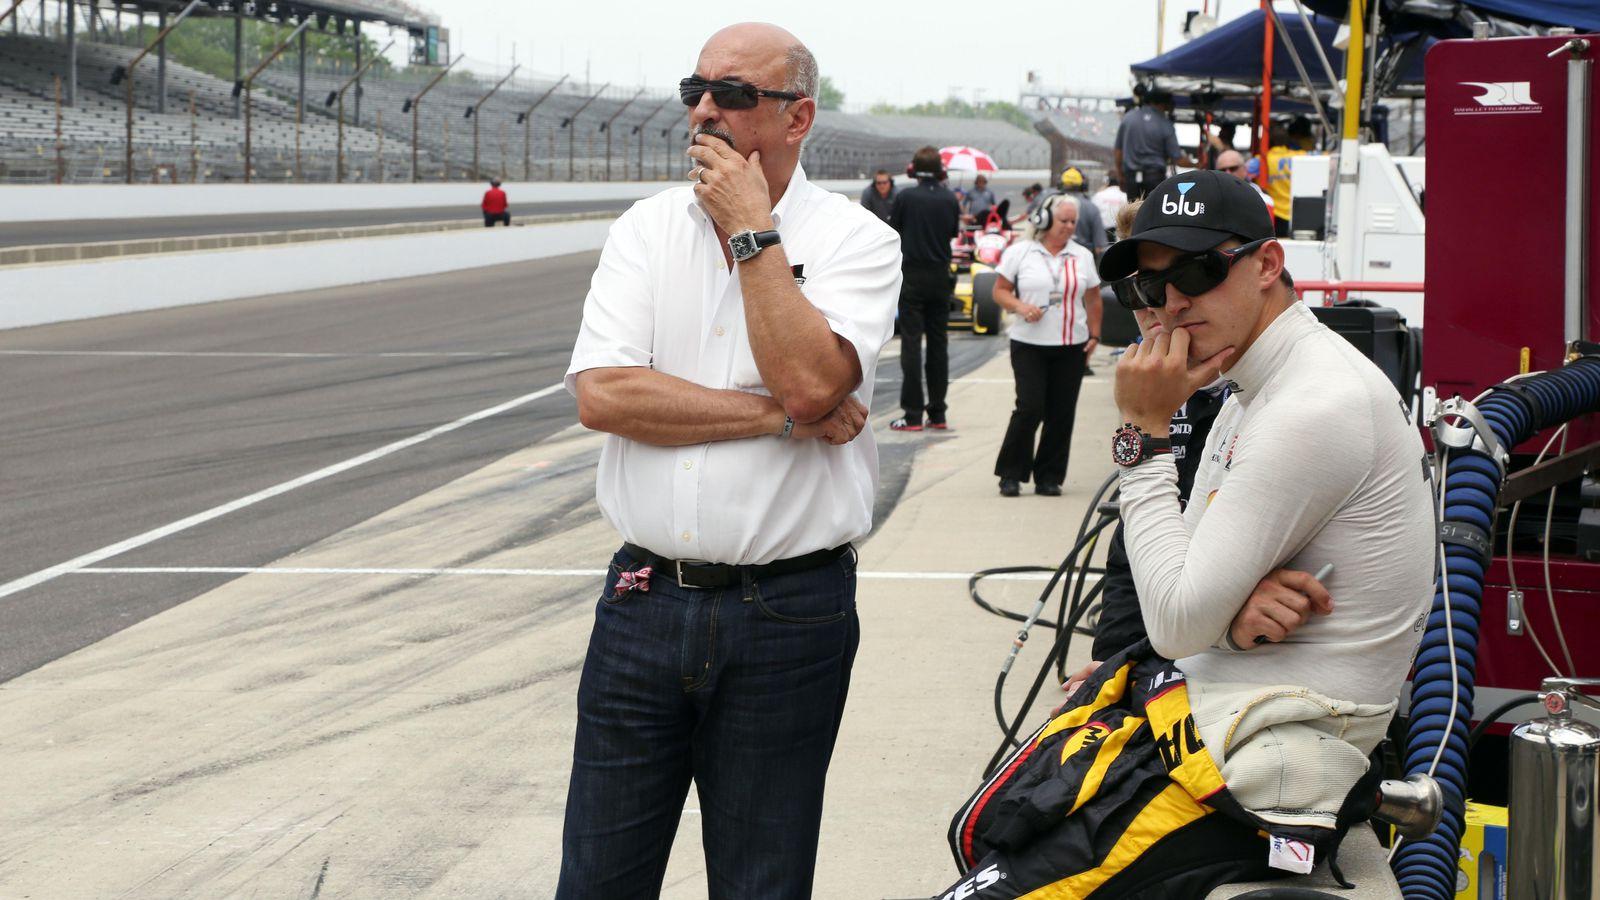 格雷厄姆·拉哈尔(Graham Rahal):Turbo在印第安纳波利斯(Indianapolis)的统治优于雪佛兰